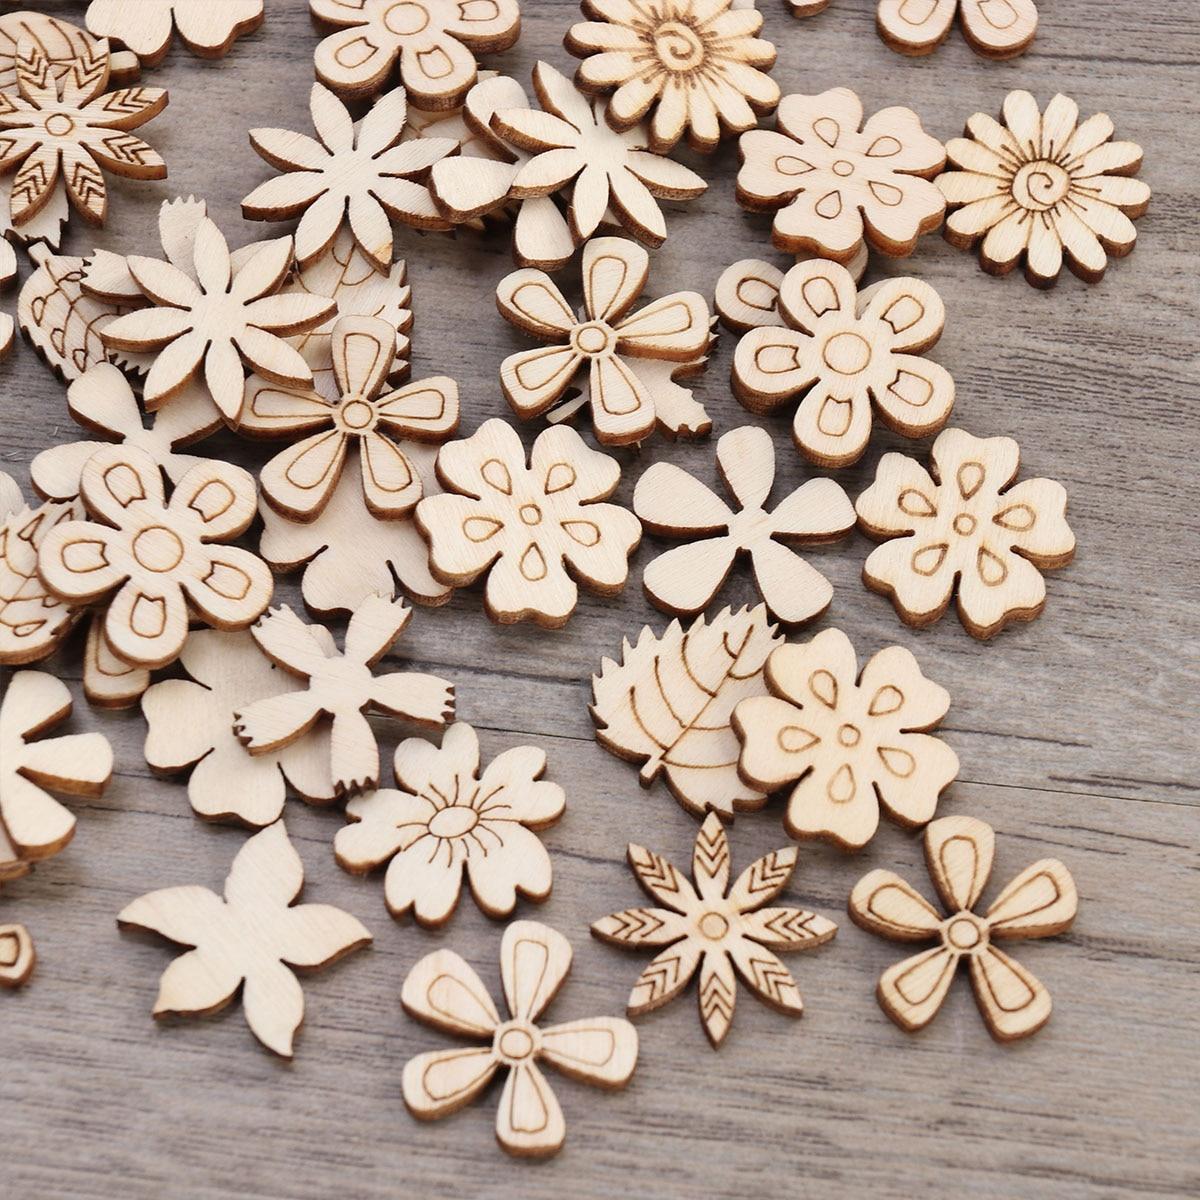 100pcs 20mm DIY Doodle Wood Decoration Wooden Ornaments Multiple Patterns Wood DIY Crafts Christmas Tree Decoration